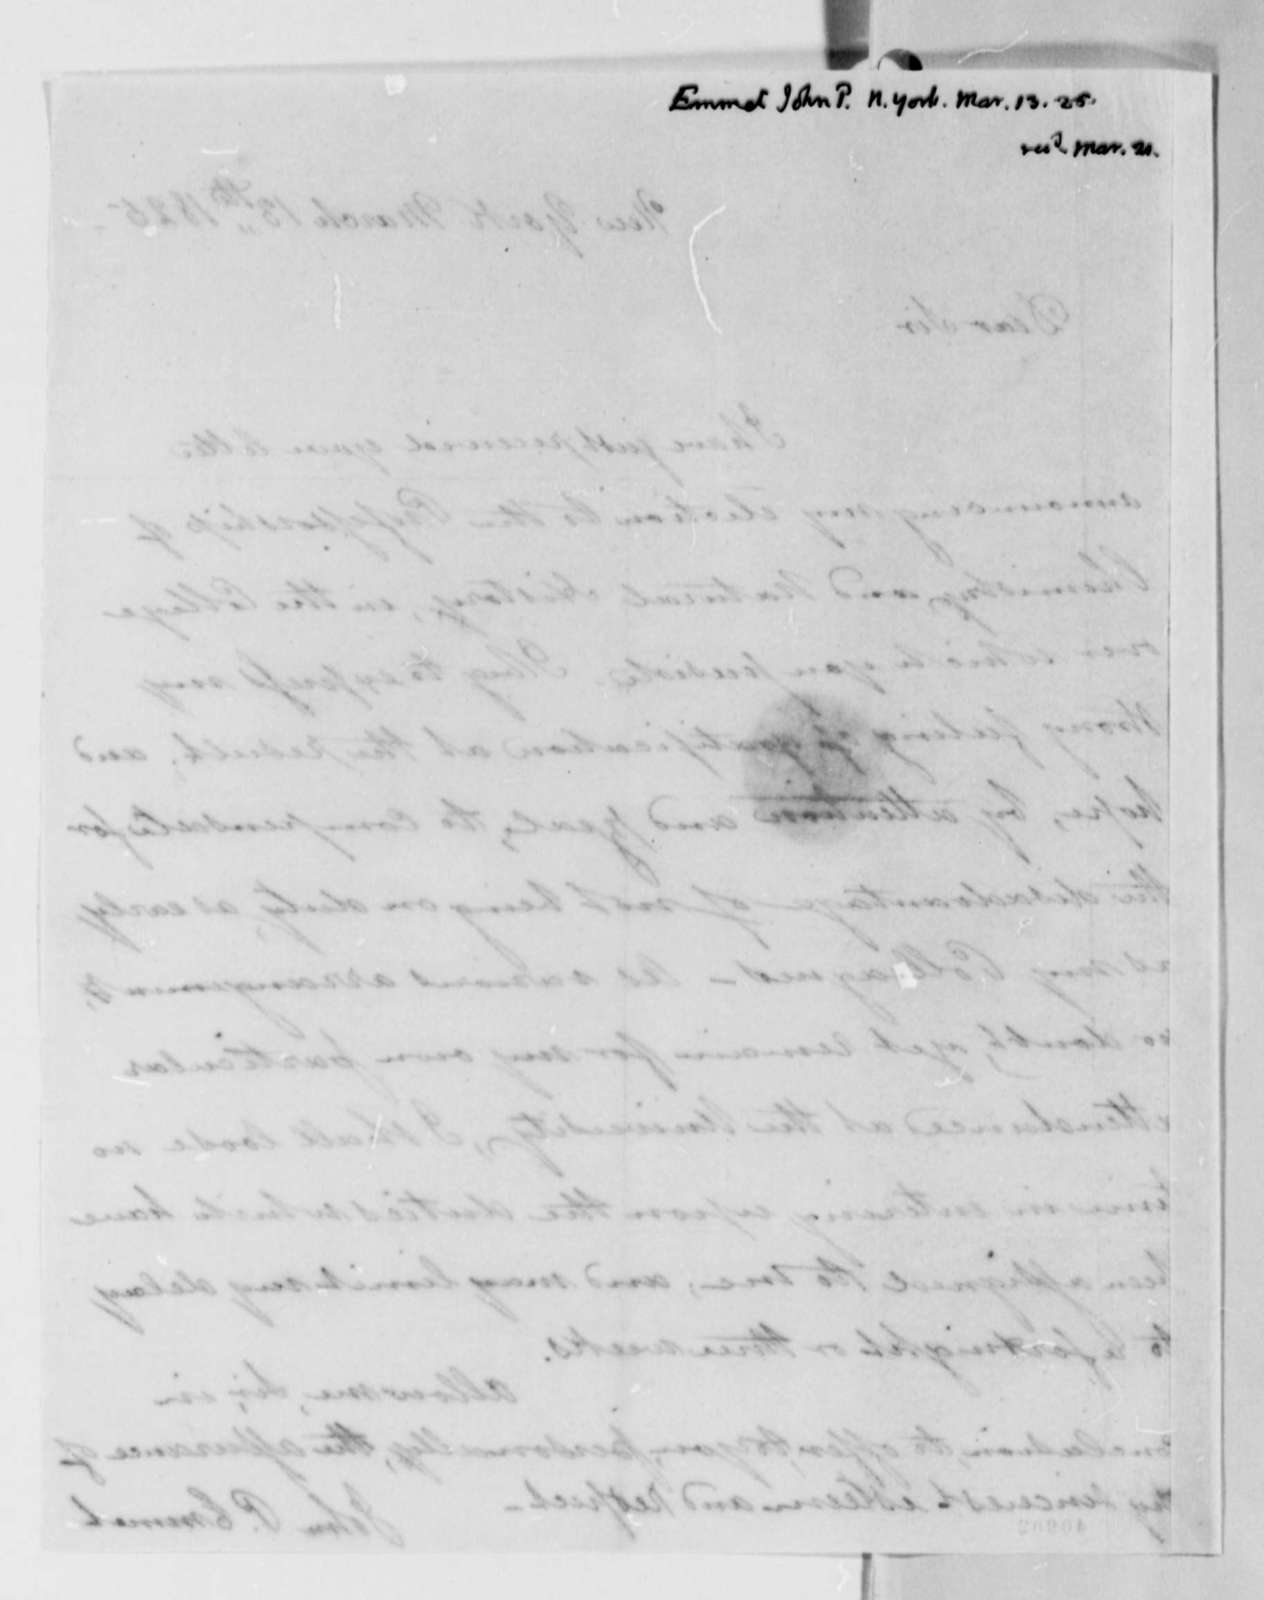 John Patten Emmet to Thomas Jefferson, March 13, 1825